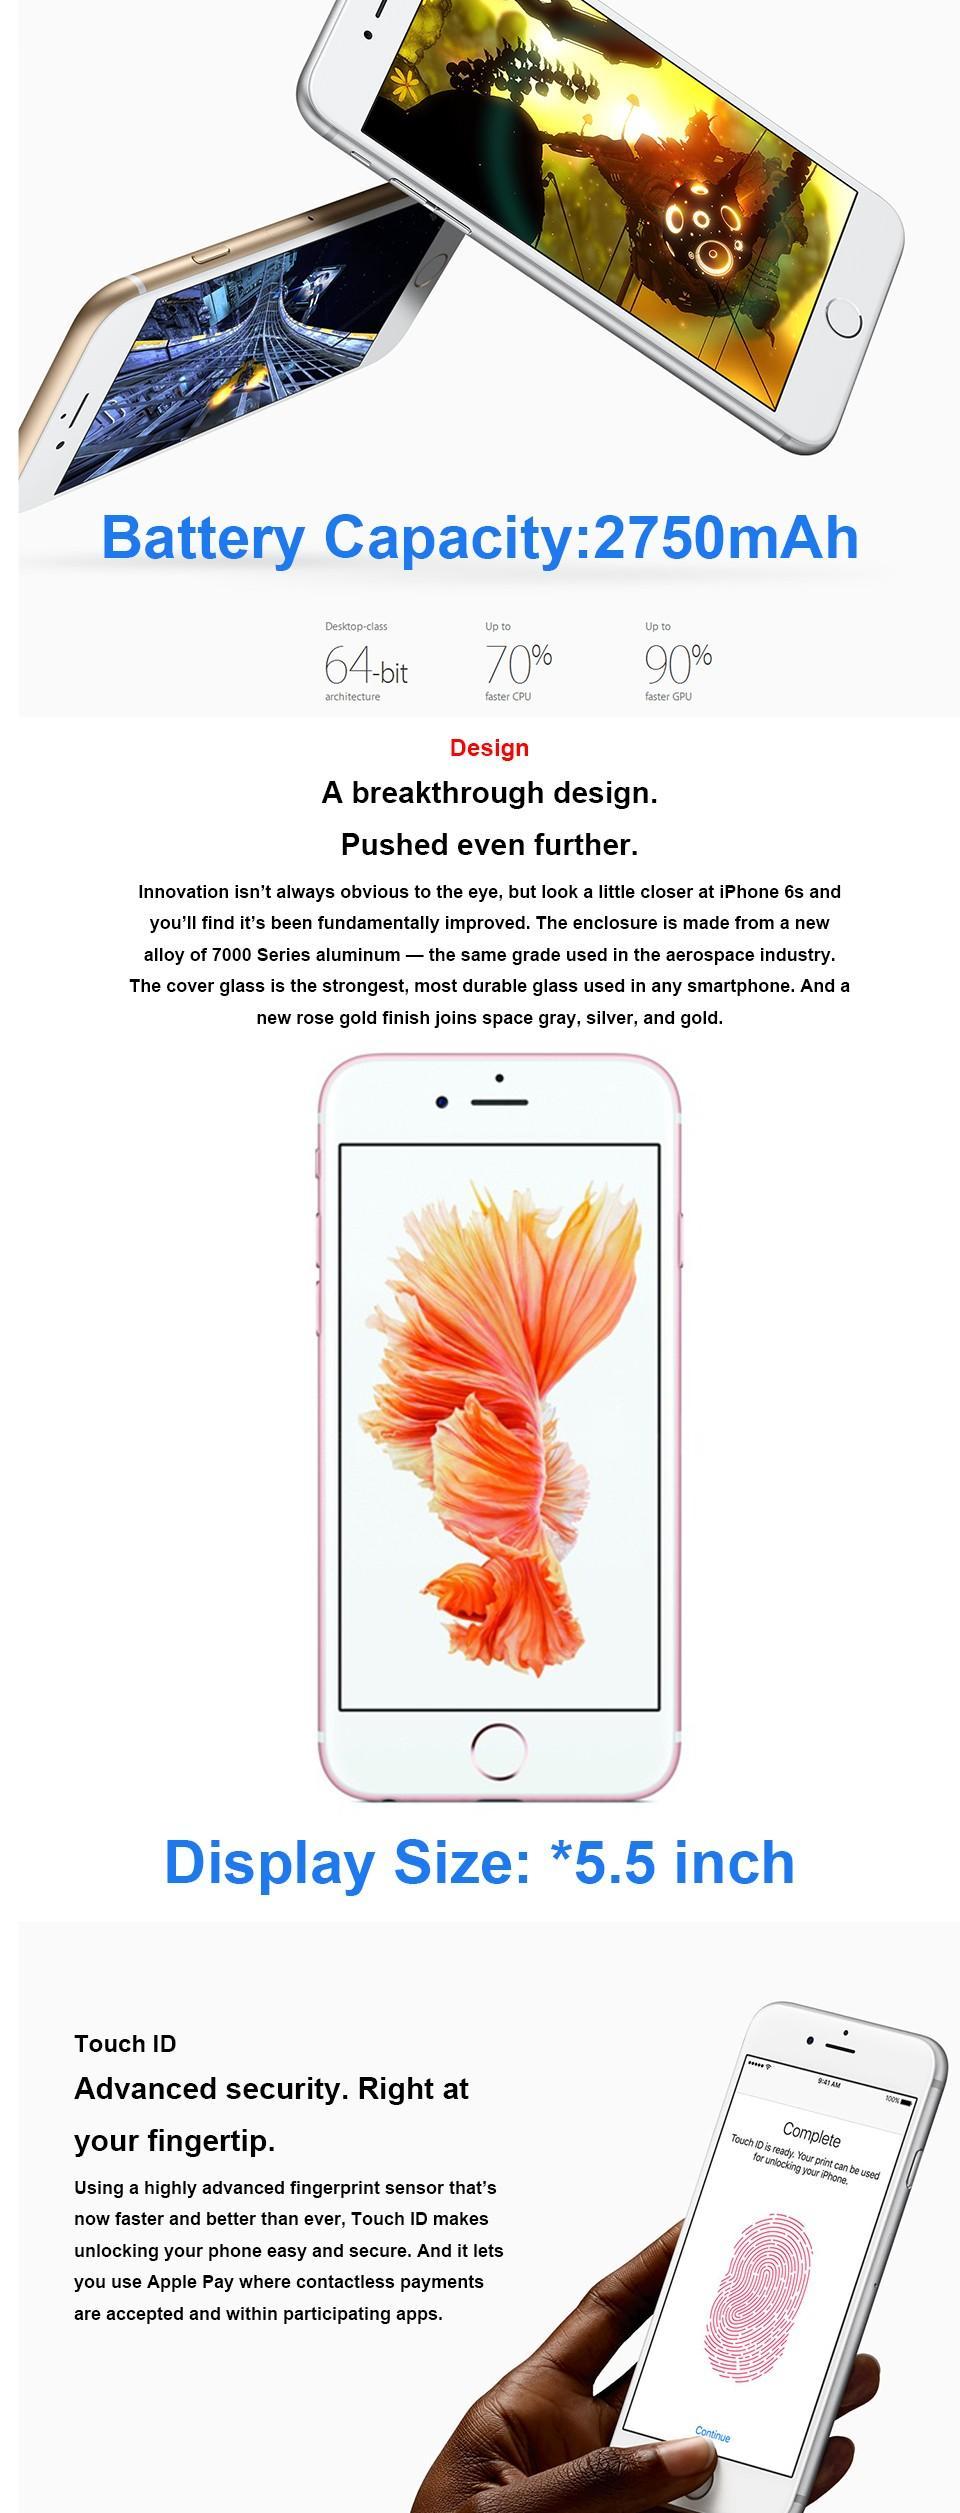 wholesale Original Unlocked iPhone 6s iPhone 6s Plus 12MP Camera Cell Phone 4 7&5 5 IPS 2GB RAM 16 64 128GB ROM IOS LTE with fingerprint